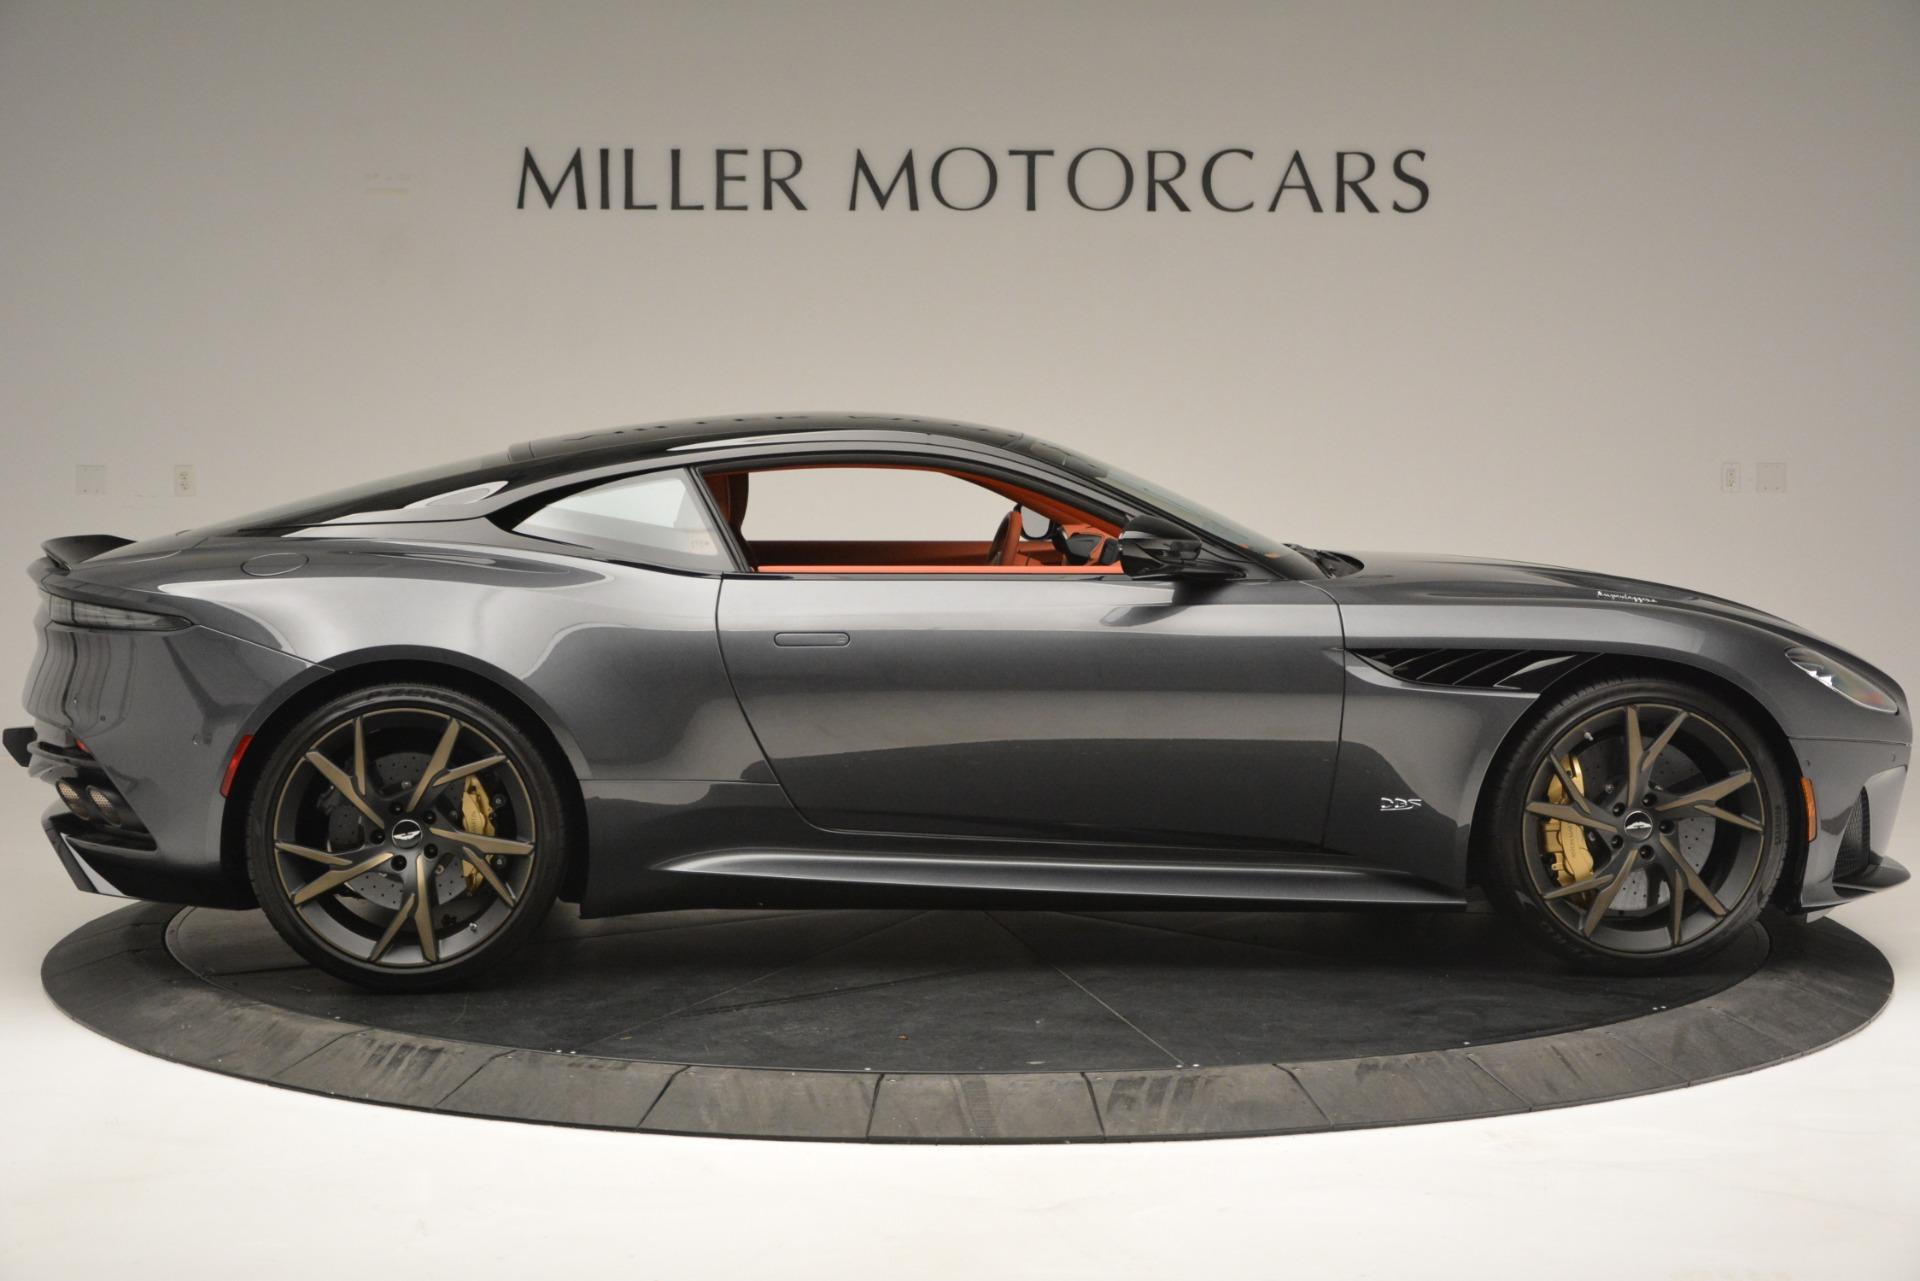 New 2019 Aston Martin DBS Superleggera For Sale In Greenwich, CT 2827_p9